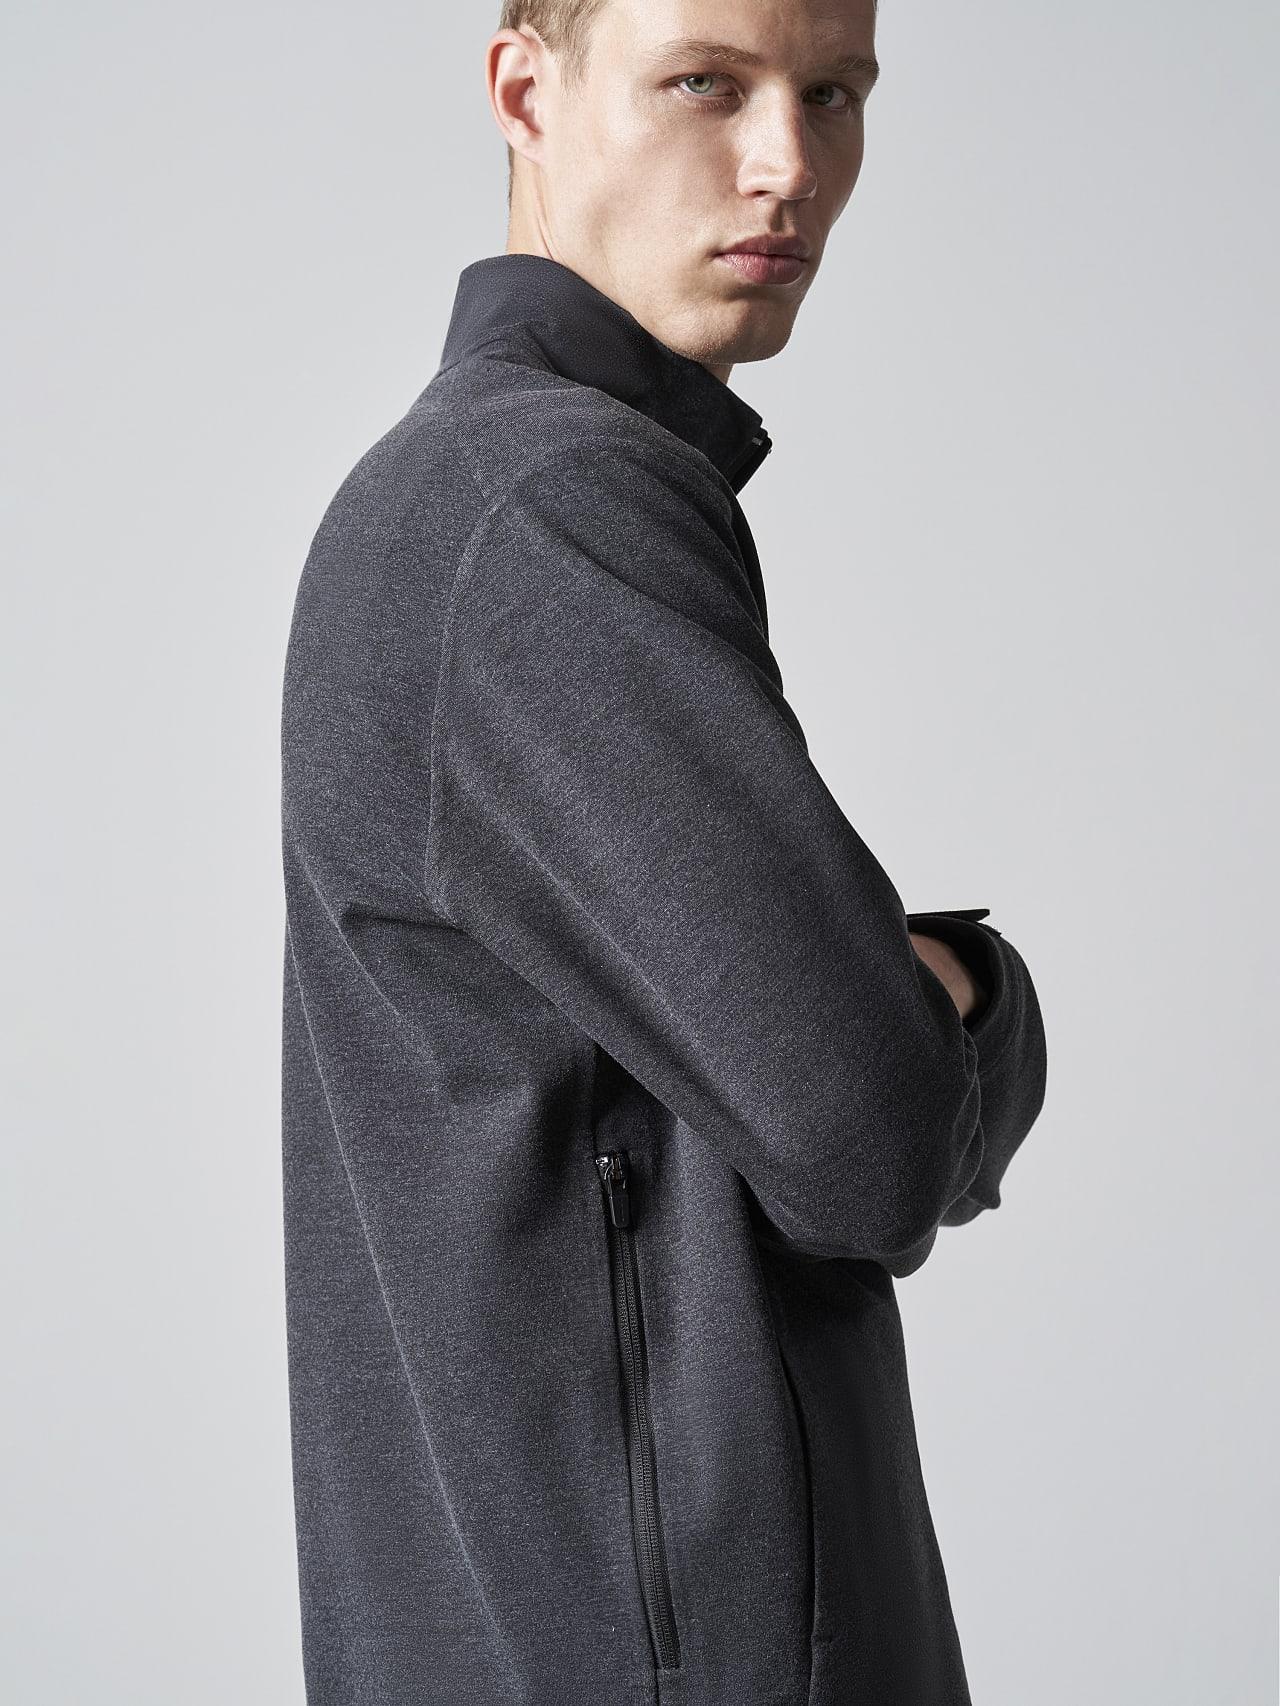 SROTO V1.Y5.02 Waterproof Half-Zip Sweatshirt dark grey / anthracite Extra Alpha Tauri